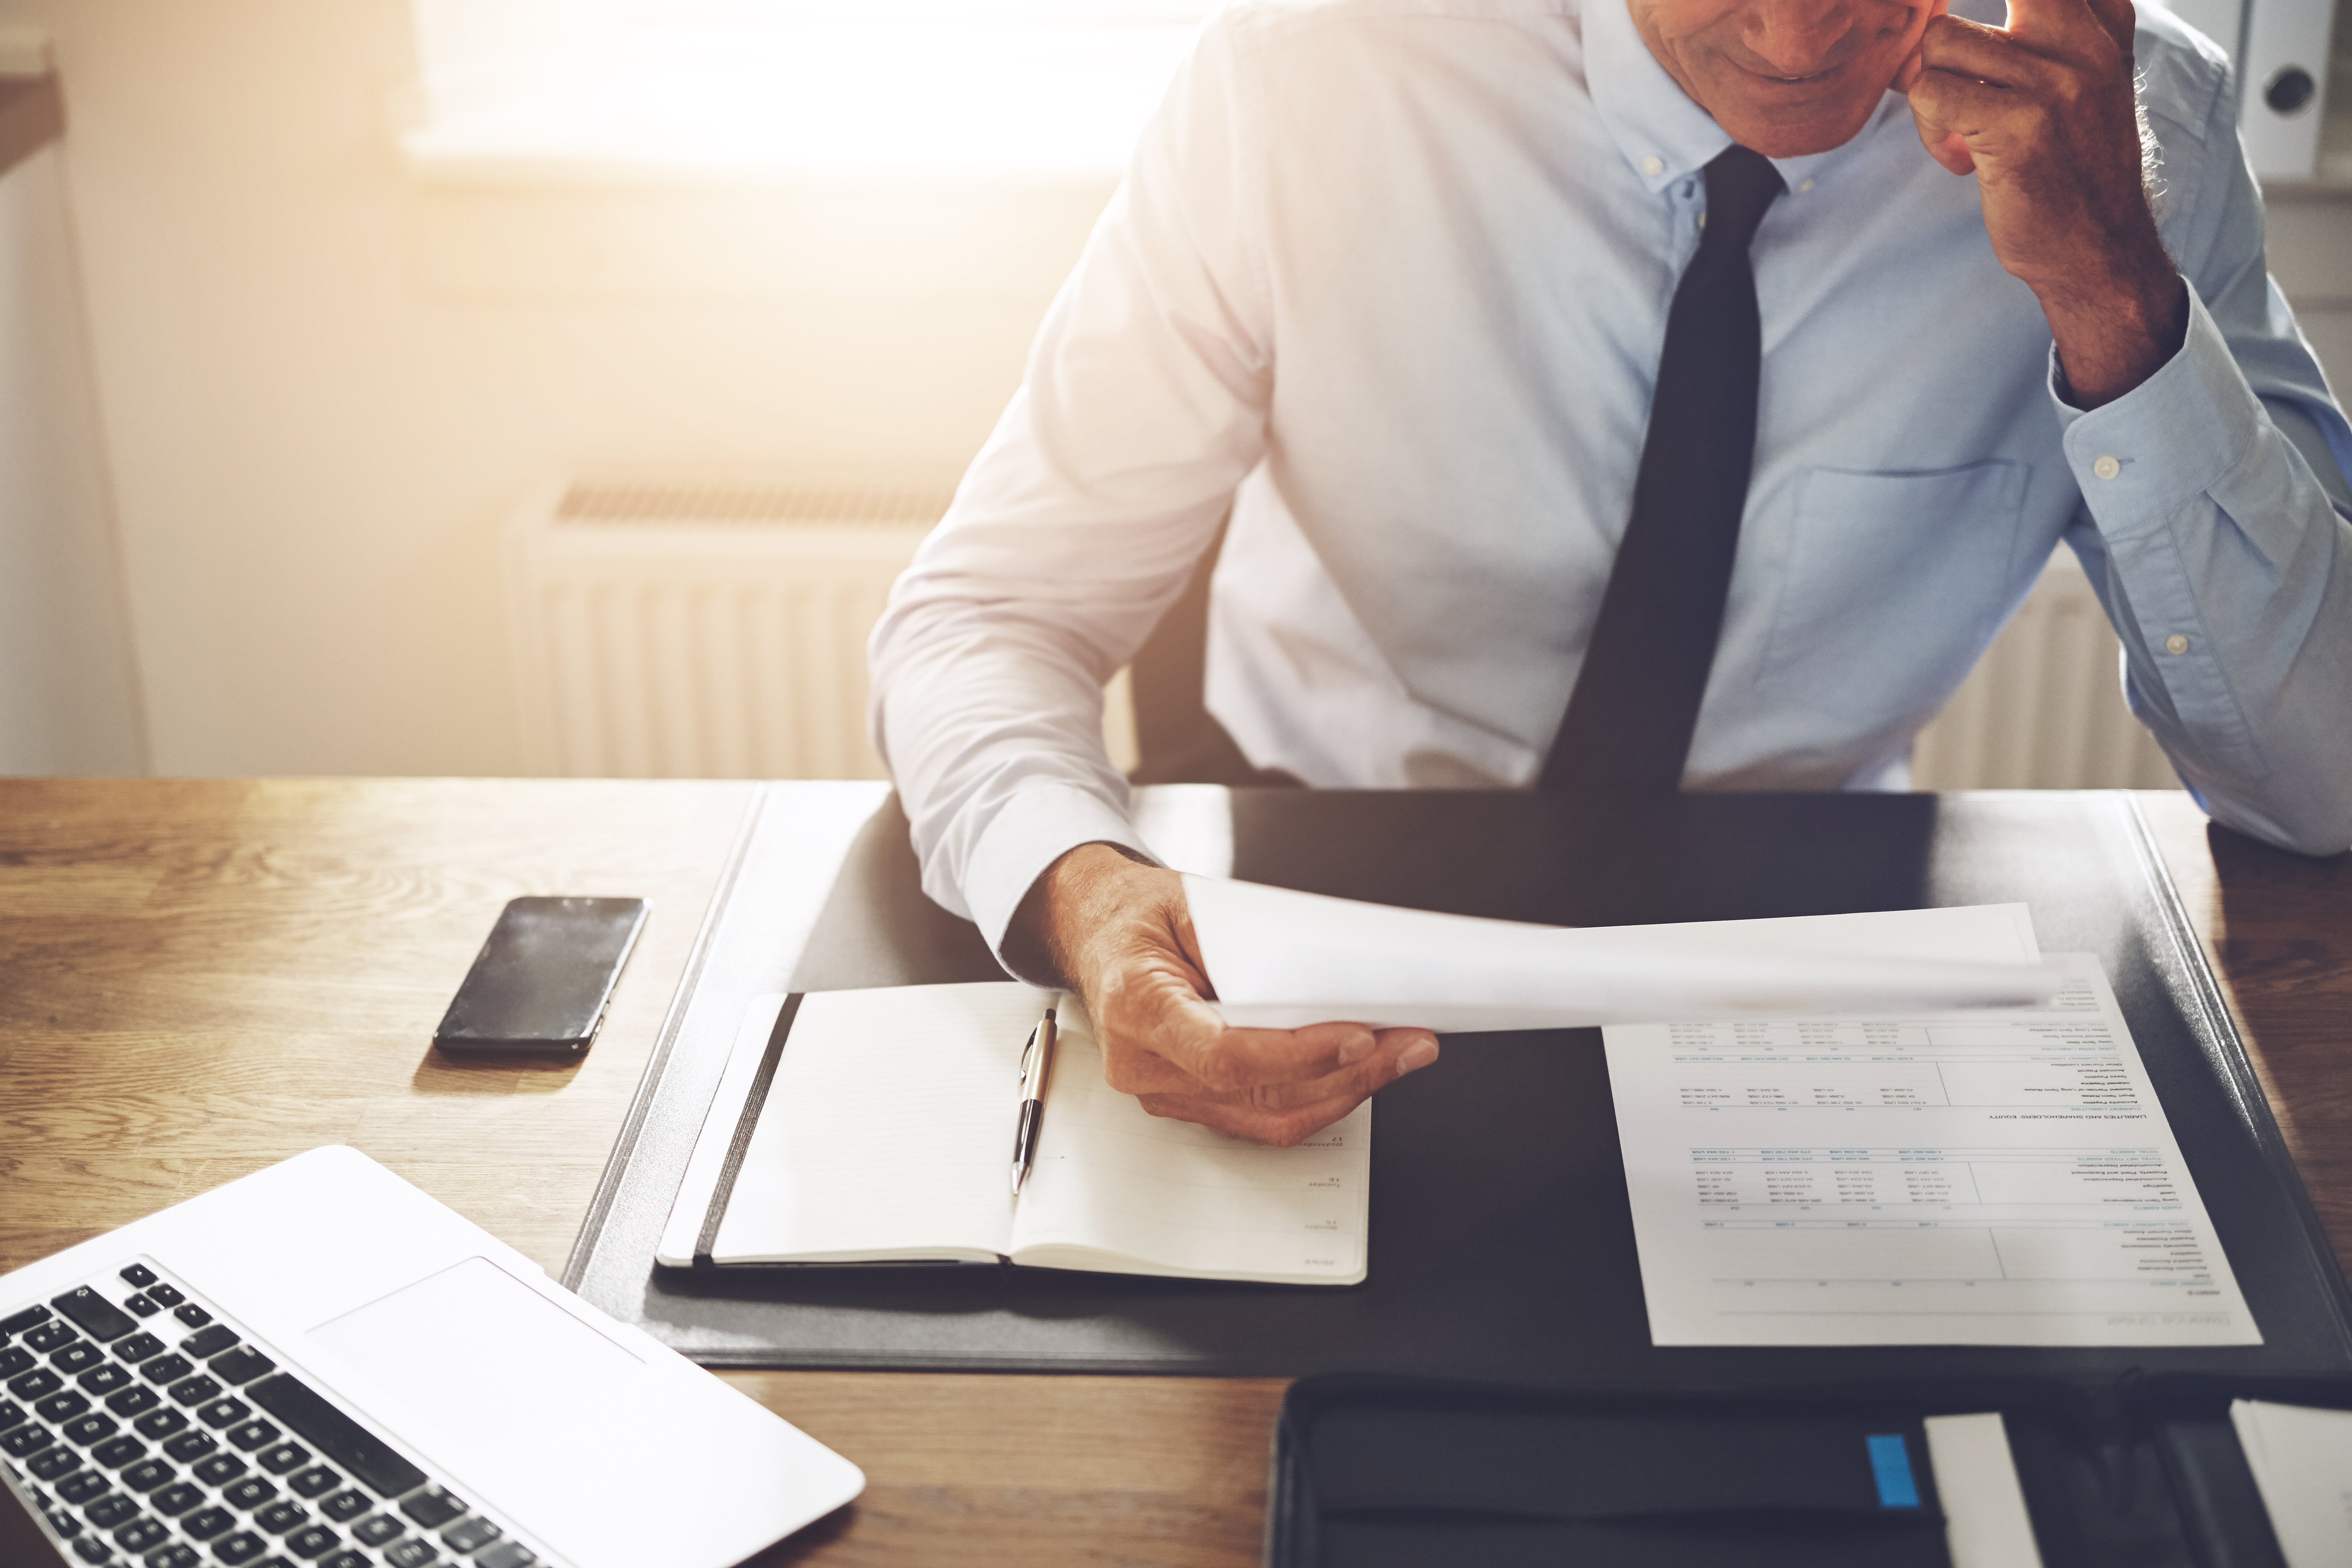 businessman-sitting-at-an-office-desk-reading-QAWYC7B.jpg